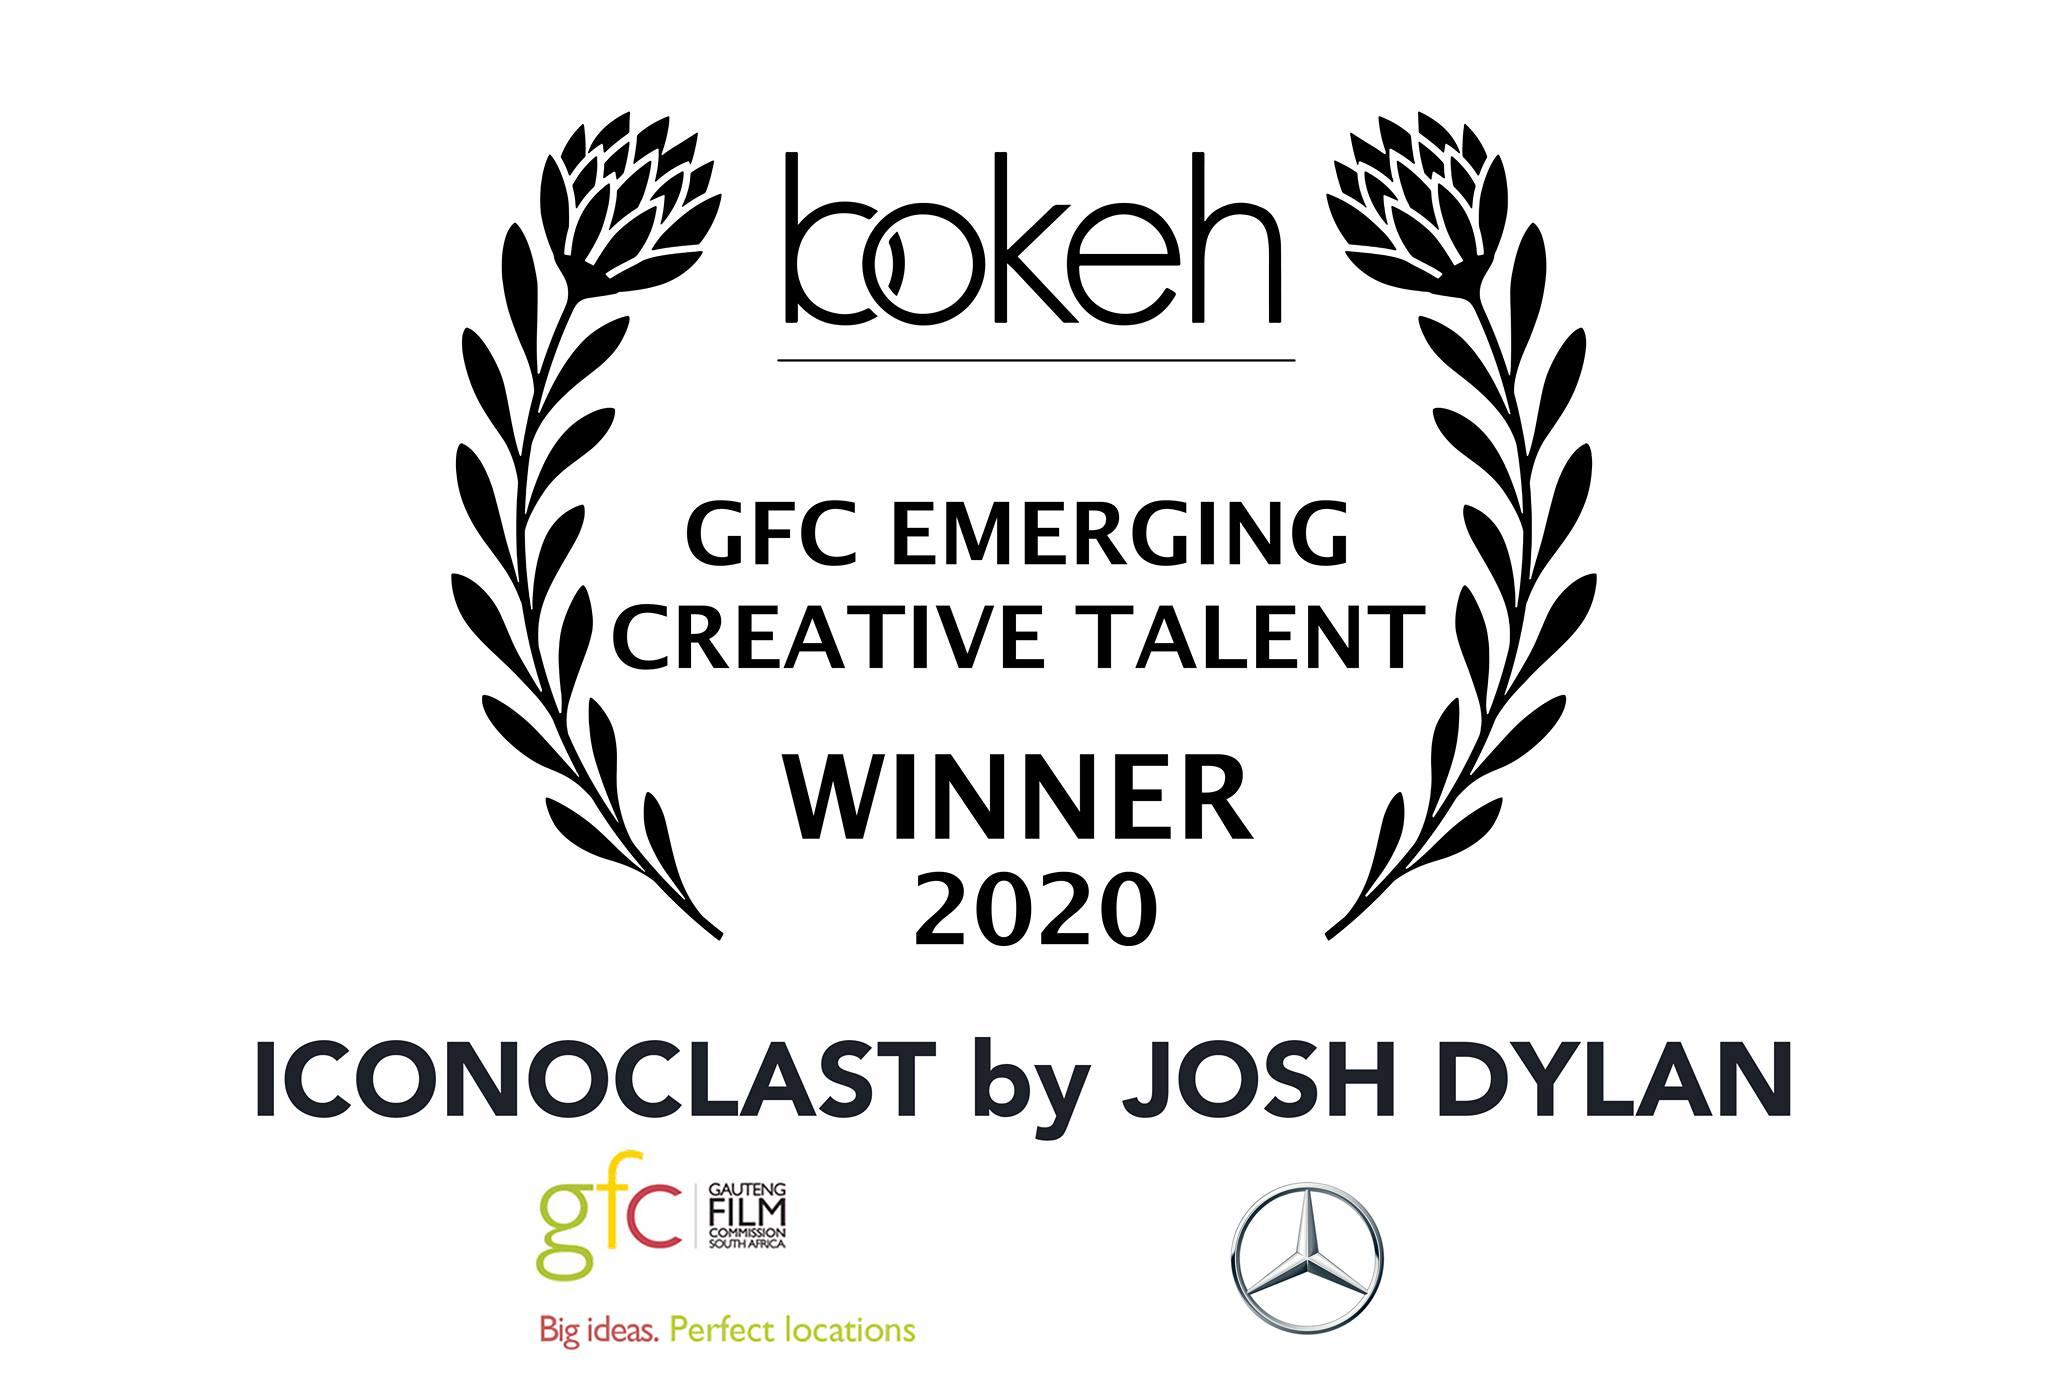 Bokeh Emerging Creative Talent Winner 2020